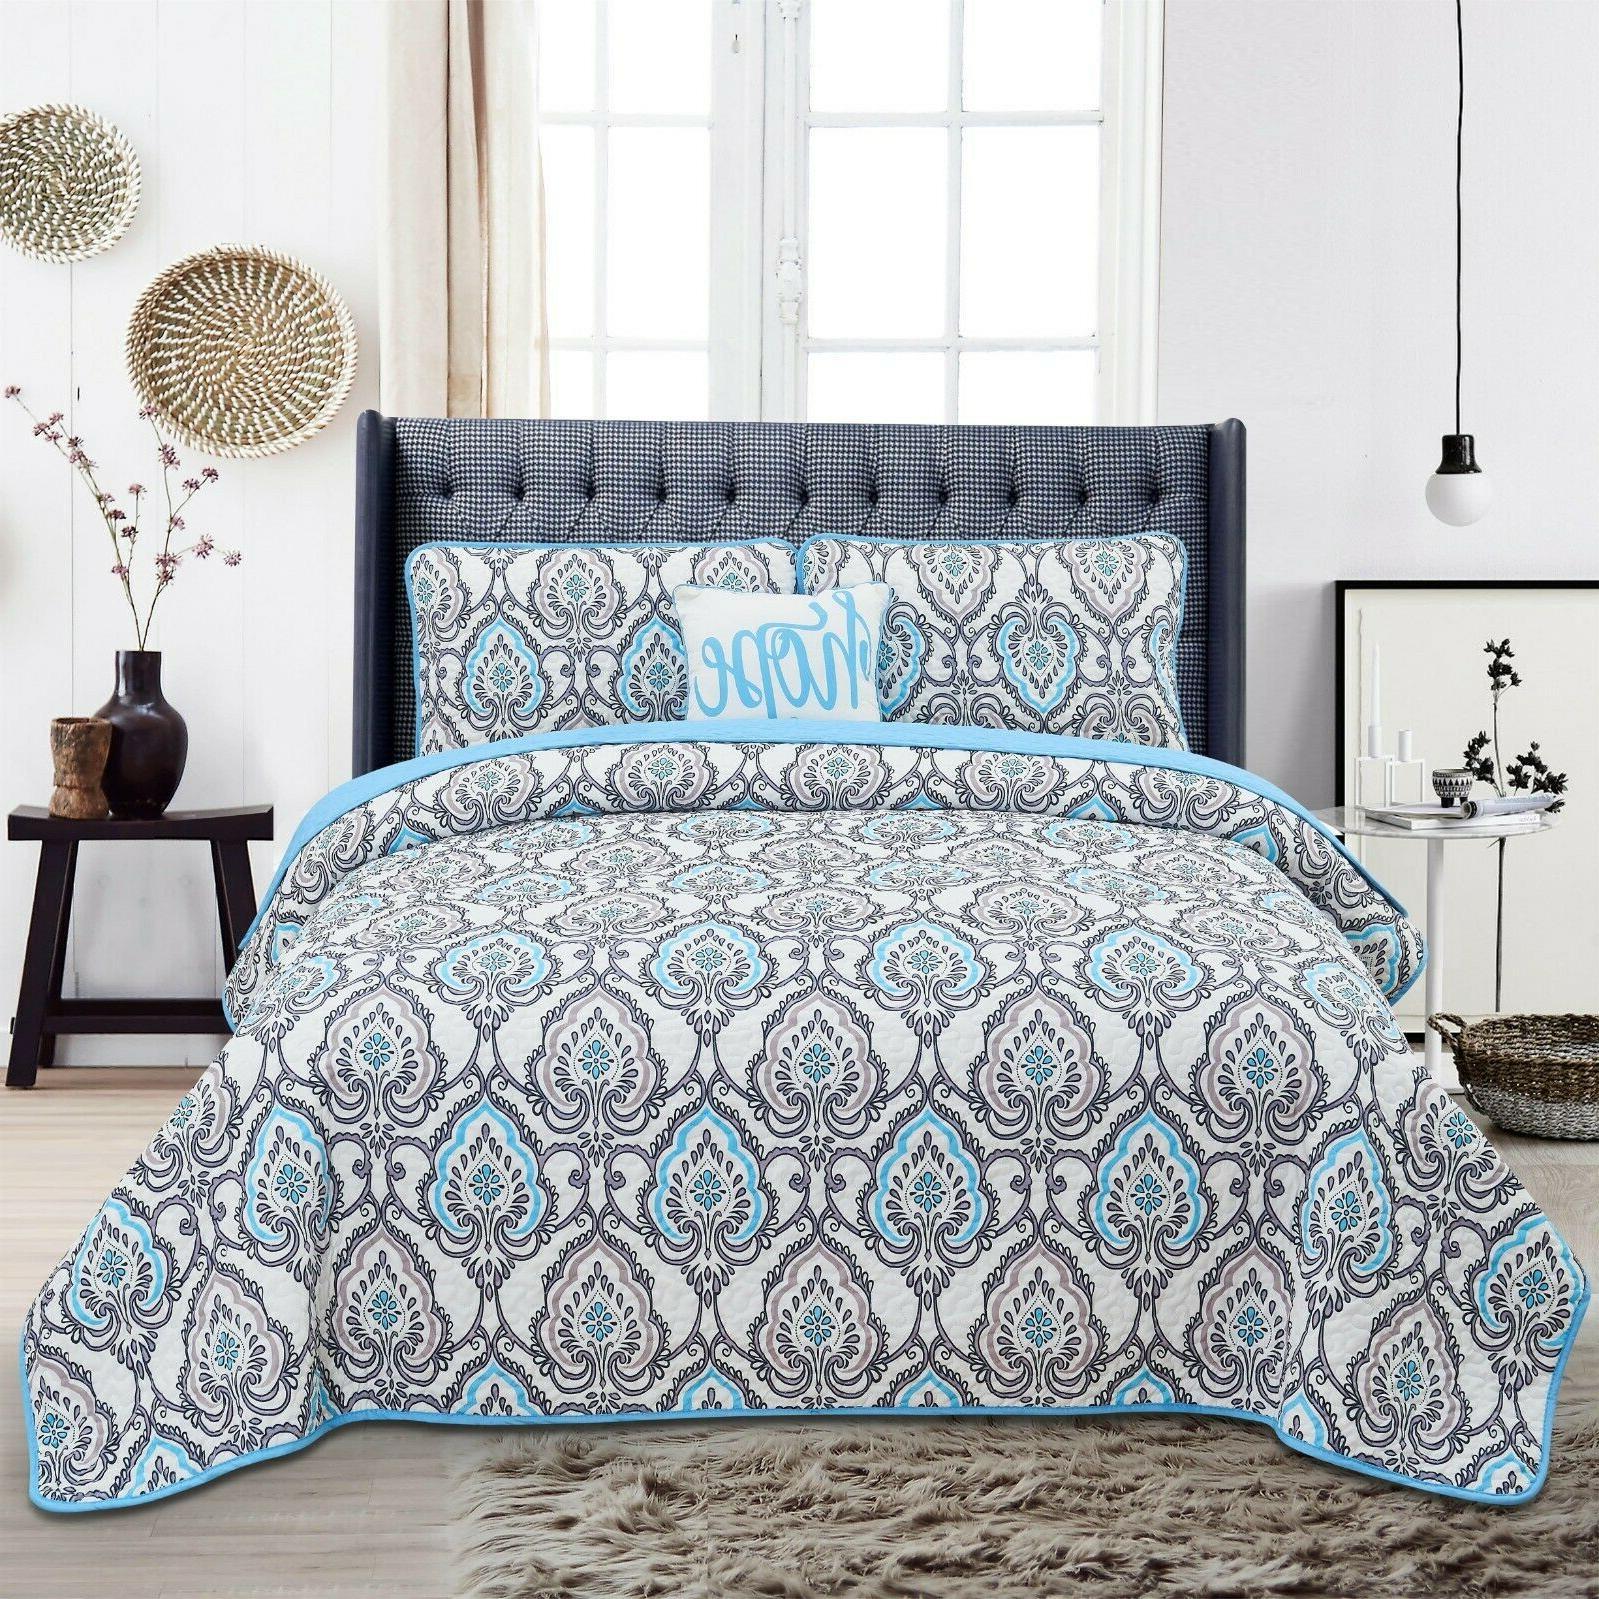 queen quilt bedding set printed pattern 4